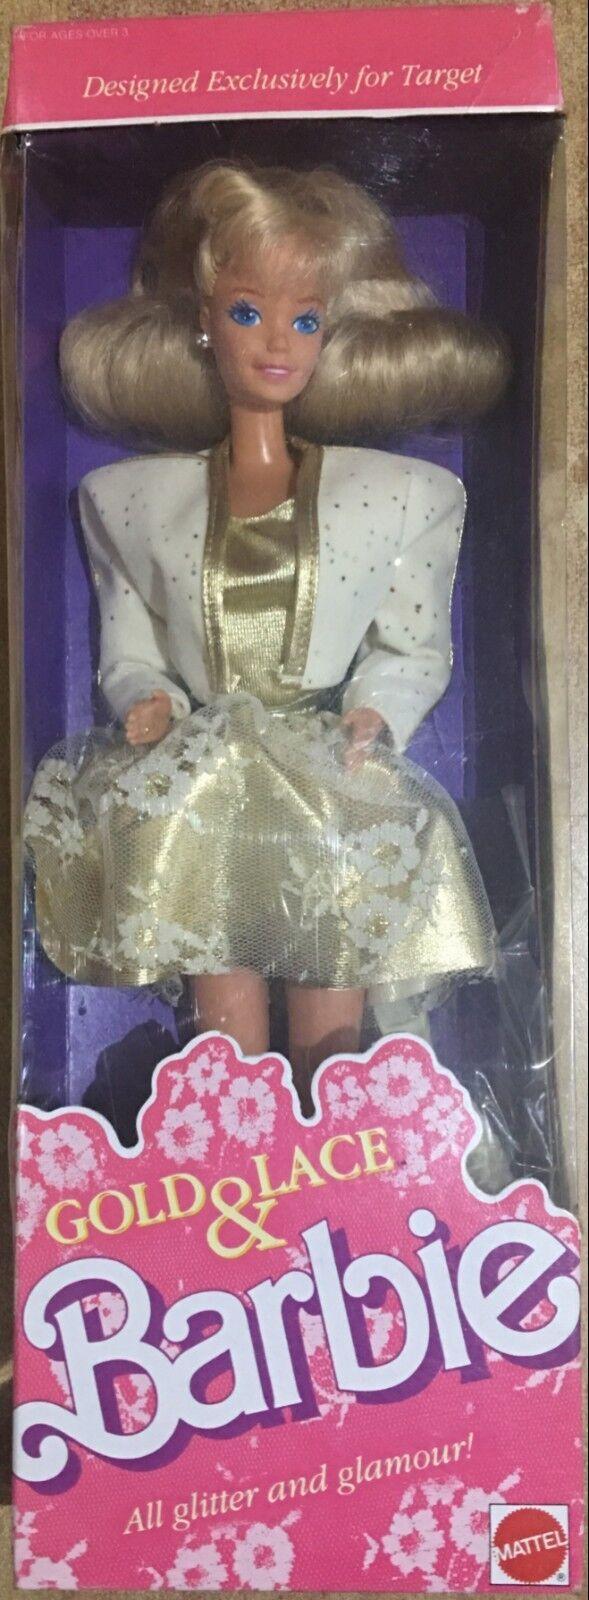 Barbie Mattel Gold&Lace Exclusive FoR Target Vintage 89'